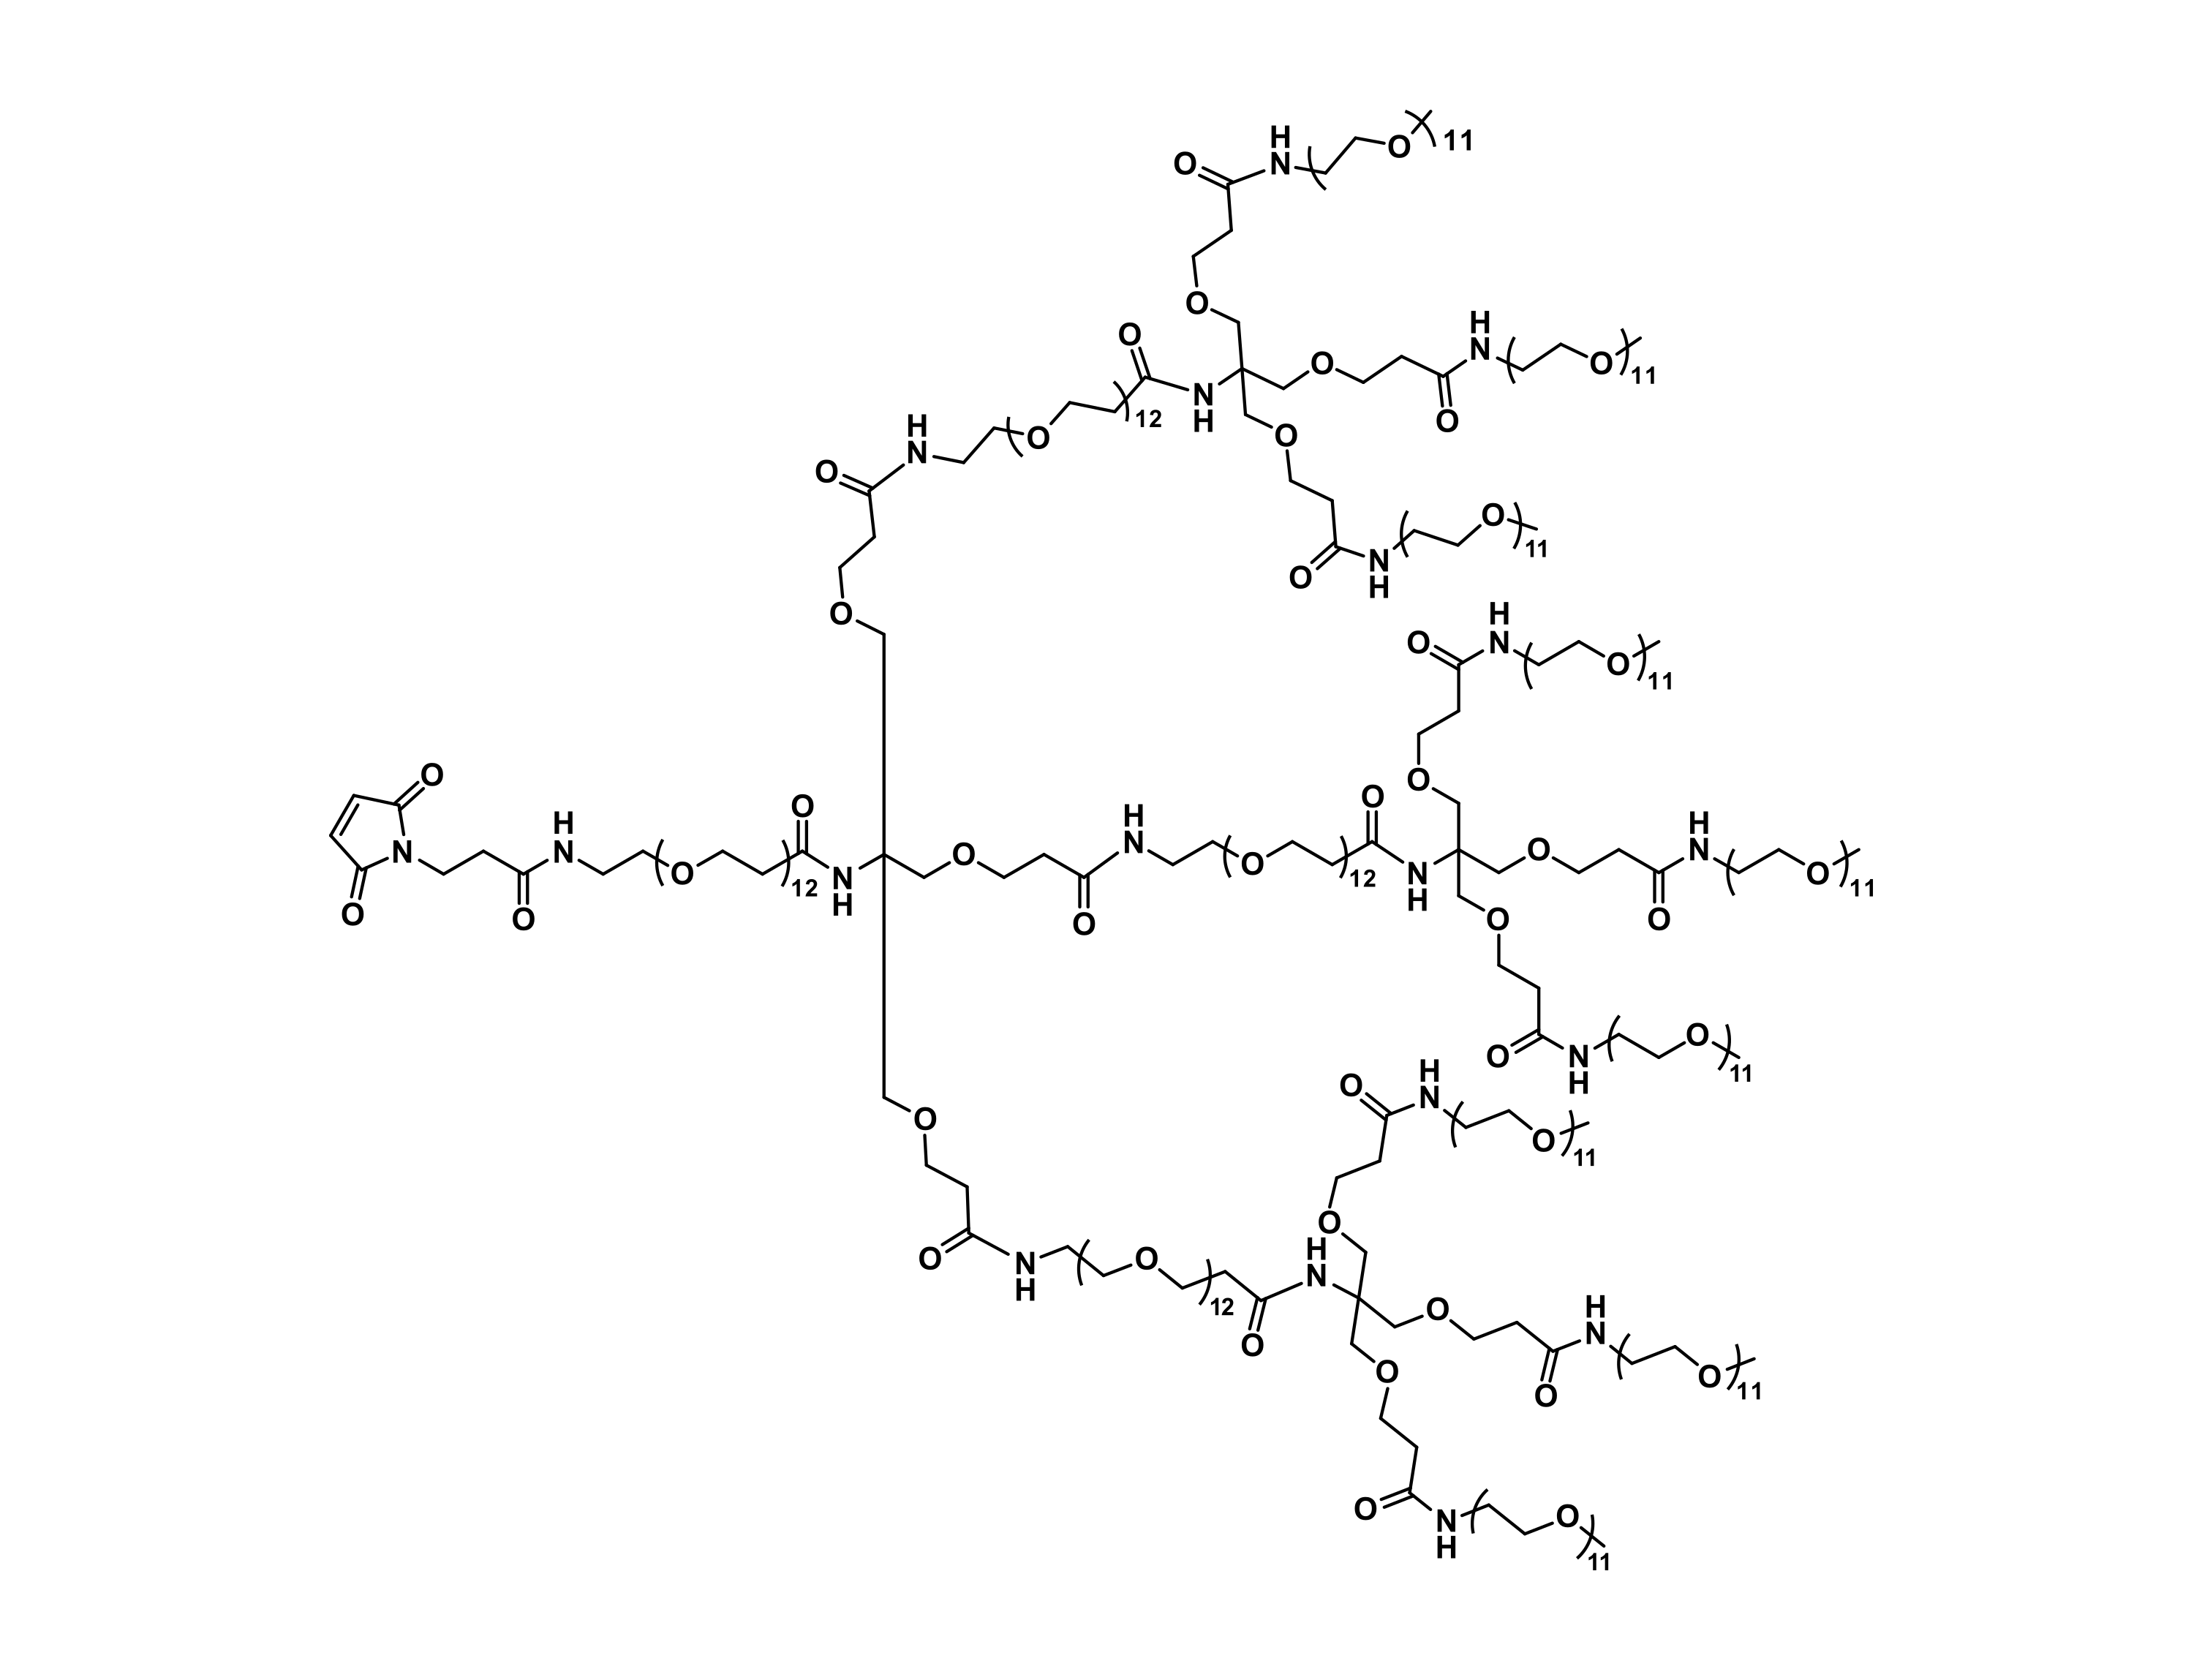 MAL-dPEG®₁₂-Tris(dPEG®₁₂-Tris(m-dPEG®₁₁)₃)₃